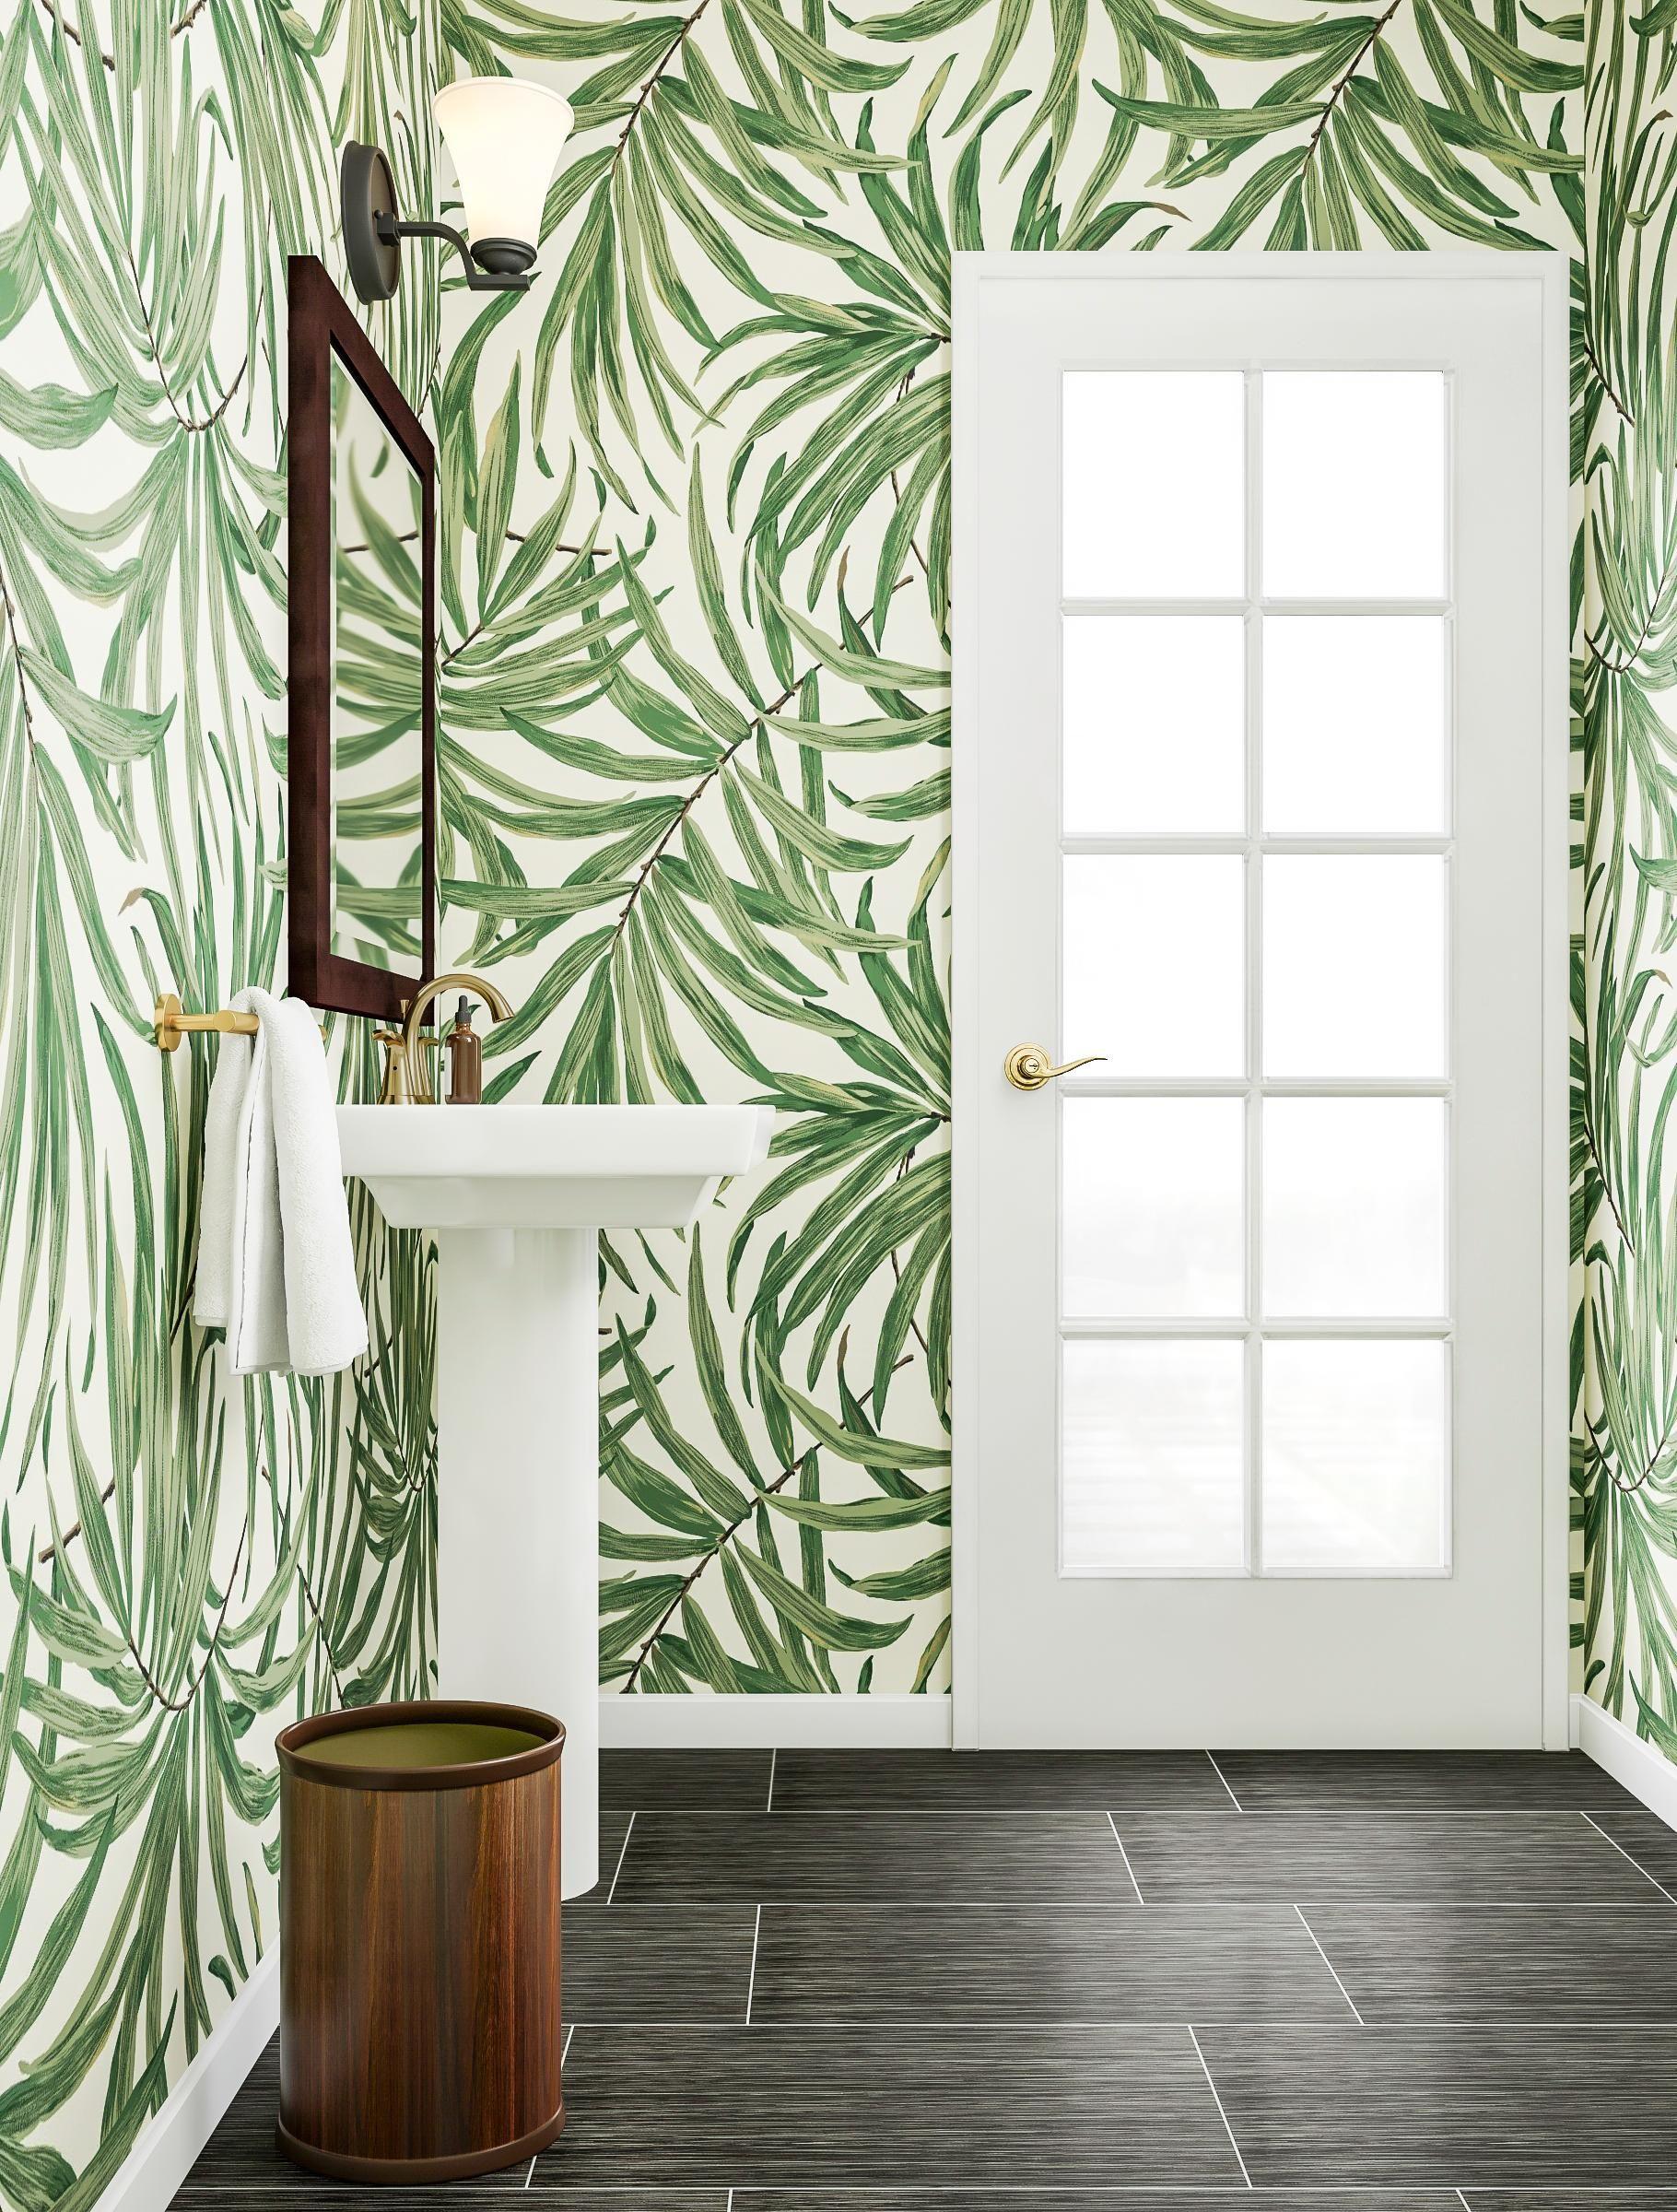 Teal Silver Mosaic Tile Effect Wallpaper Bathroom Kitchen Fd40128 Fine Decor Bathroom Wallpaper Washable Wallpaper Teal Bathroom